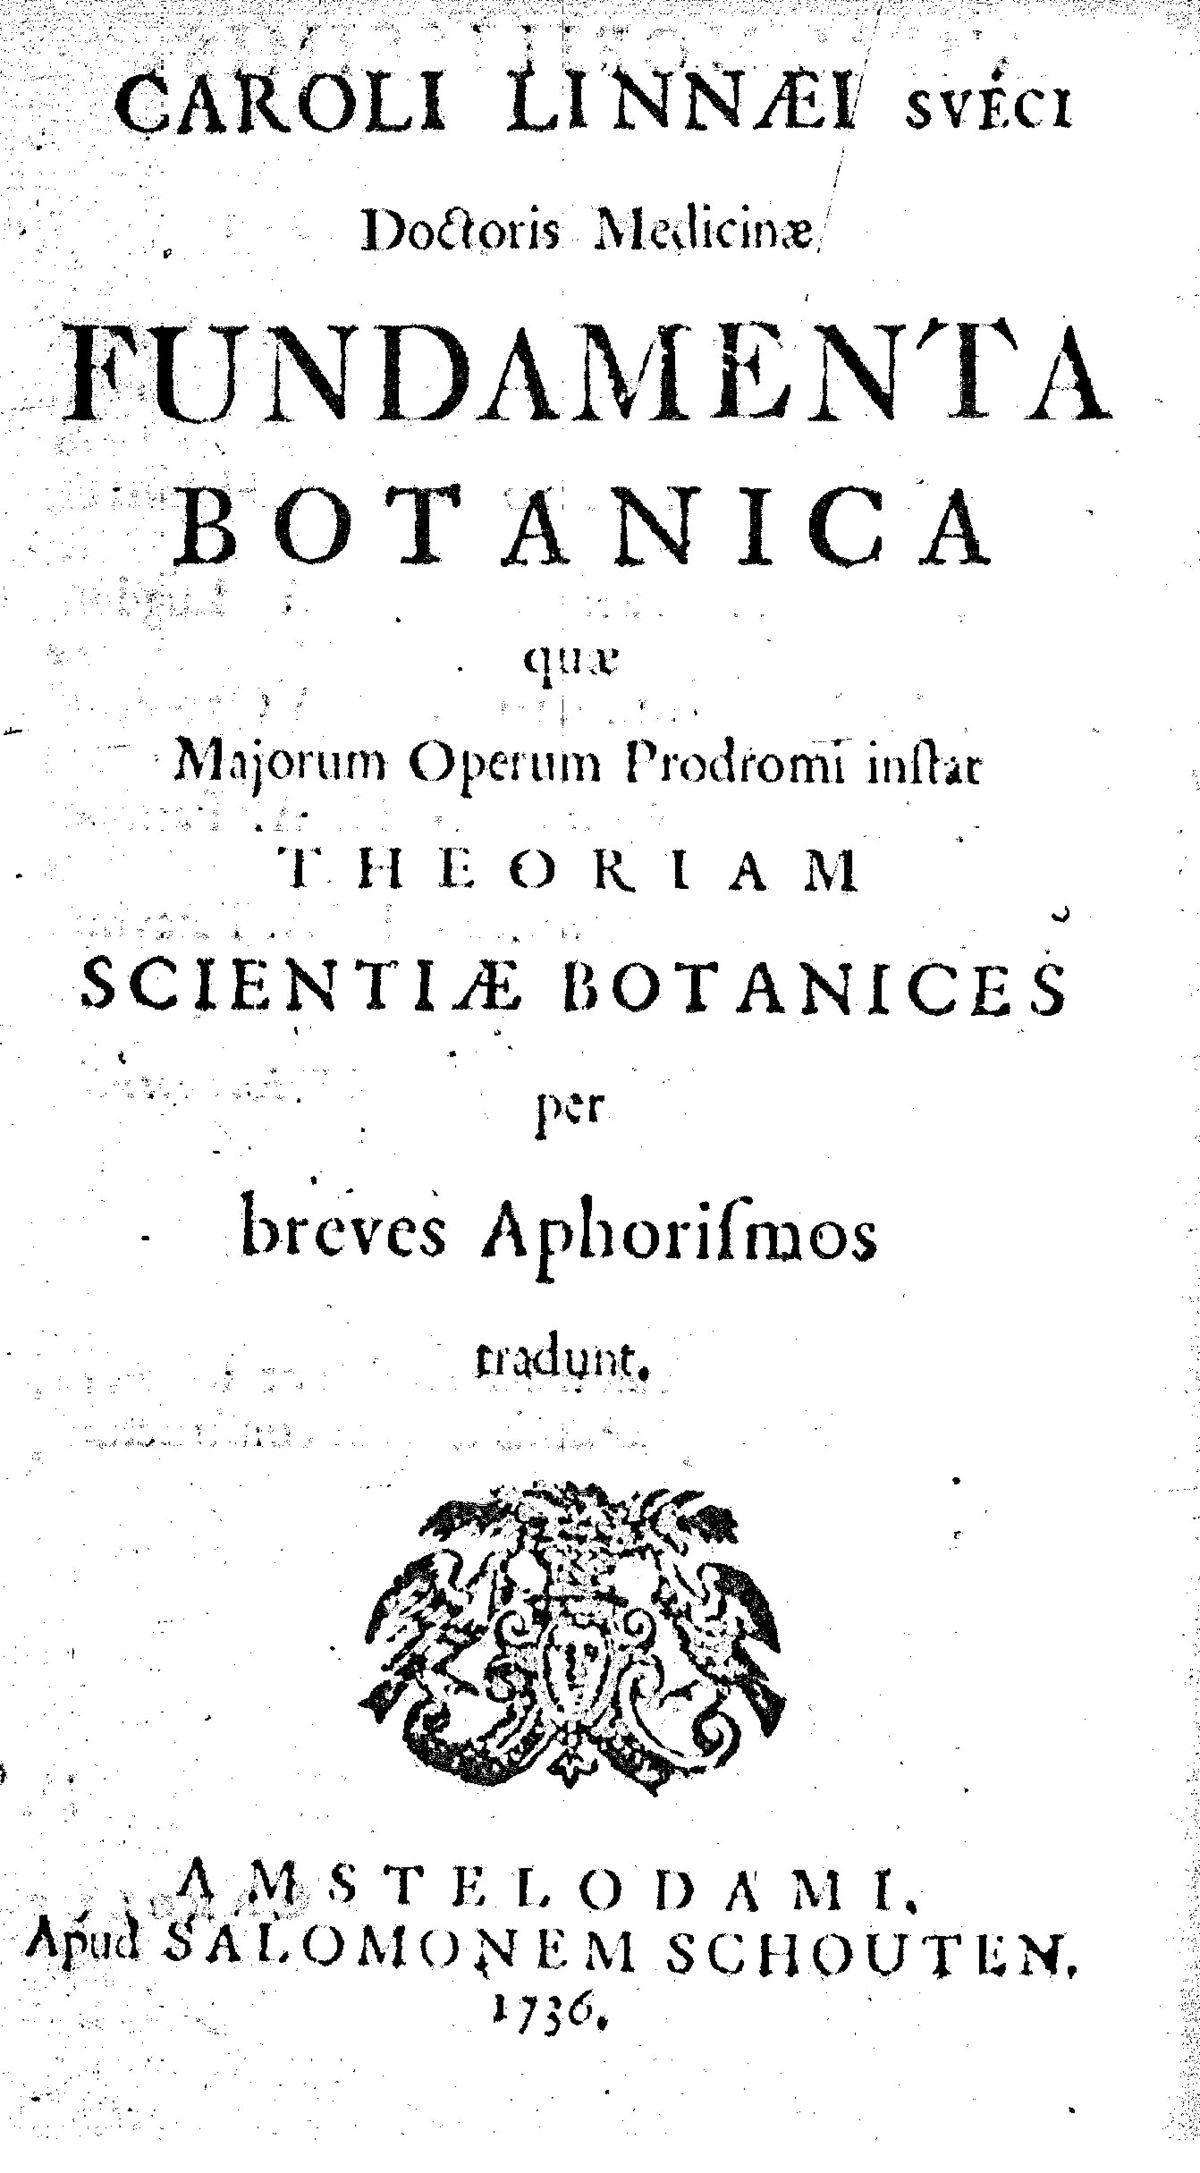 Fundamenta Botanica - Wikipedia